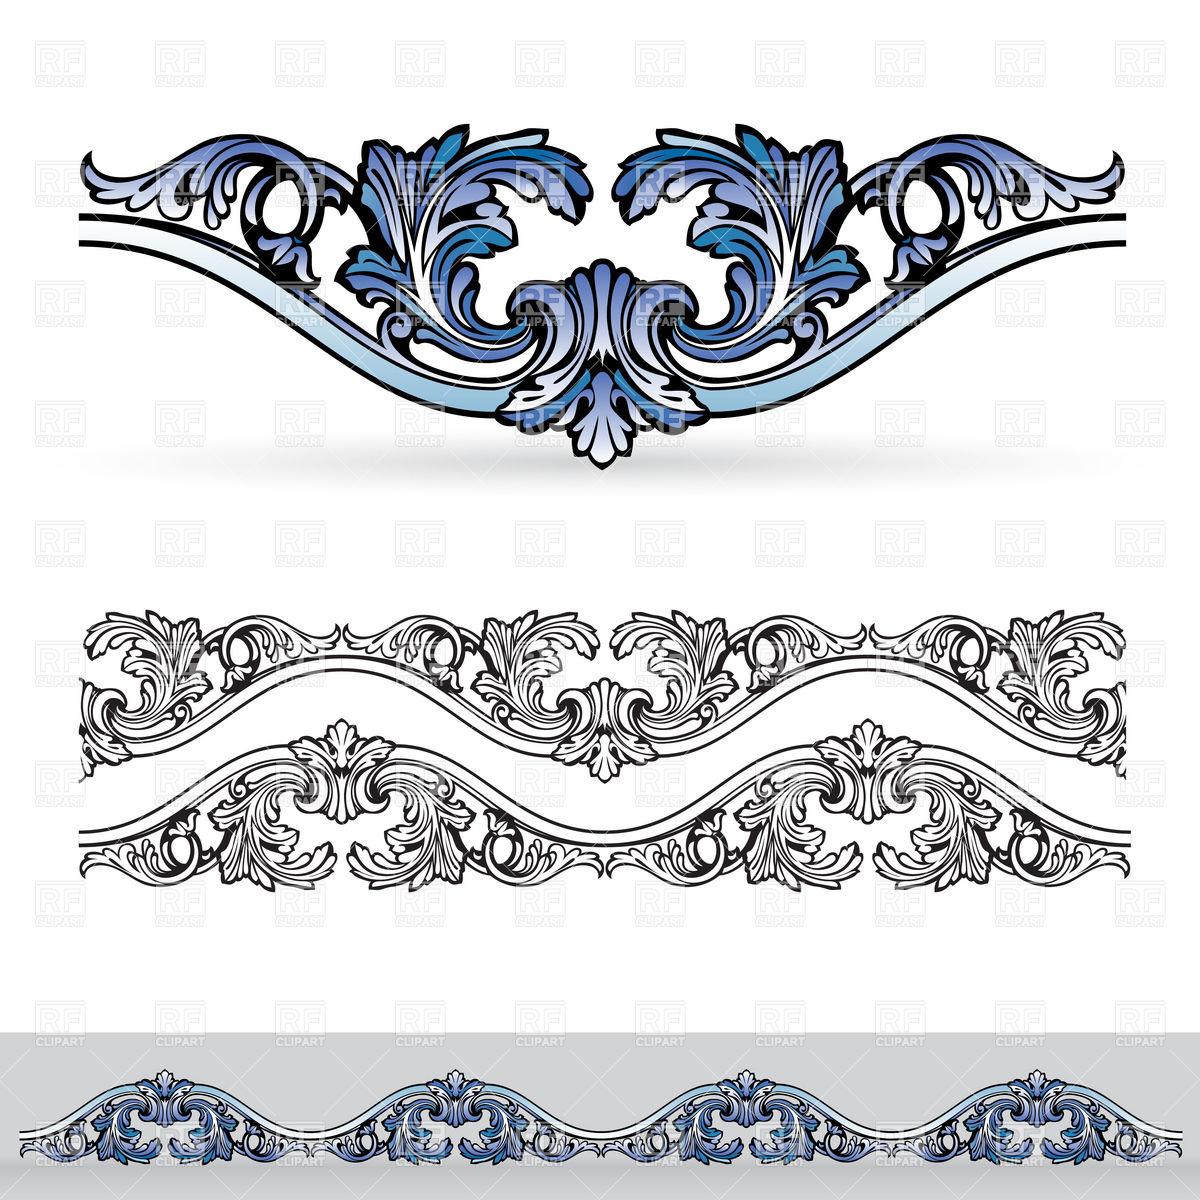 1200x1200 Floral Design Elements Vector Image Vector Artwork Of Borders